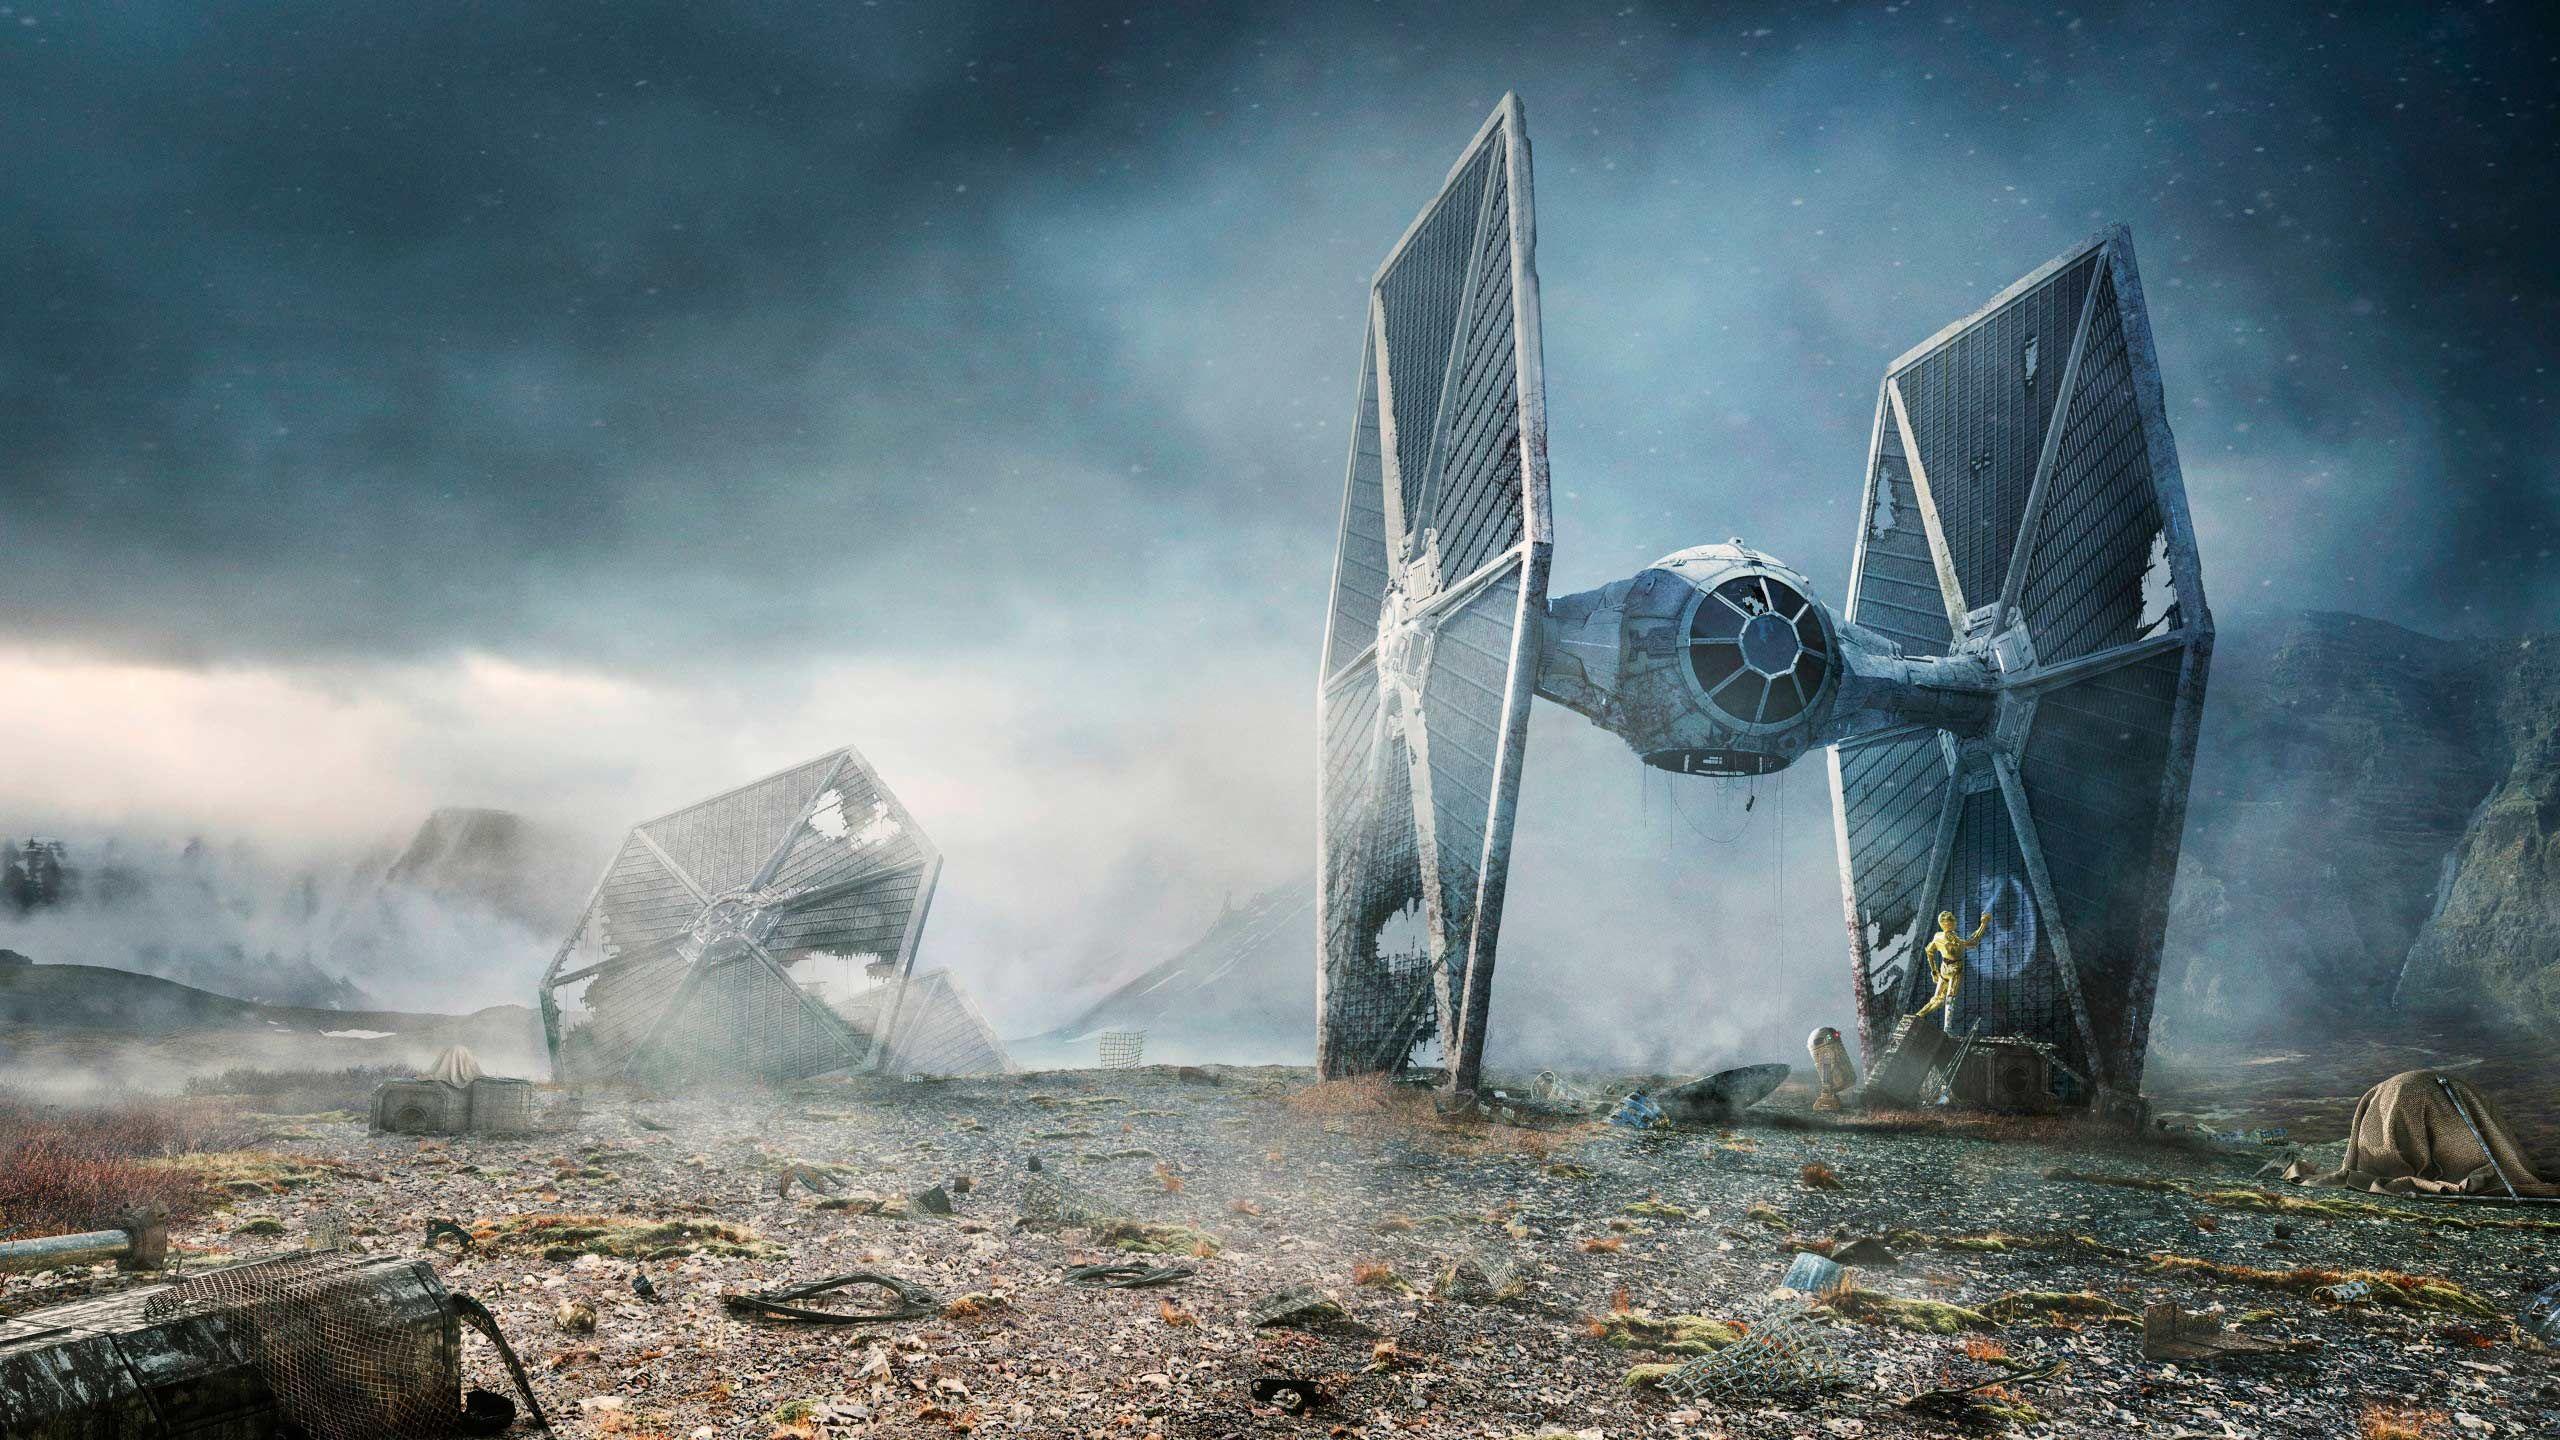 Free Tie Fighter Star Wars Computer Desktop Wallpapers Pictures Images